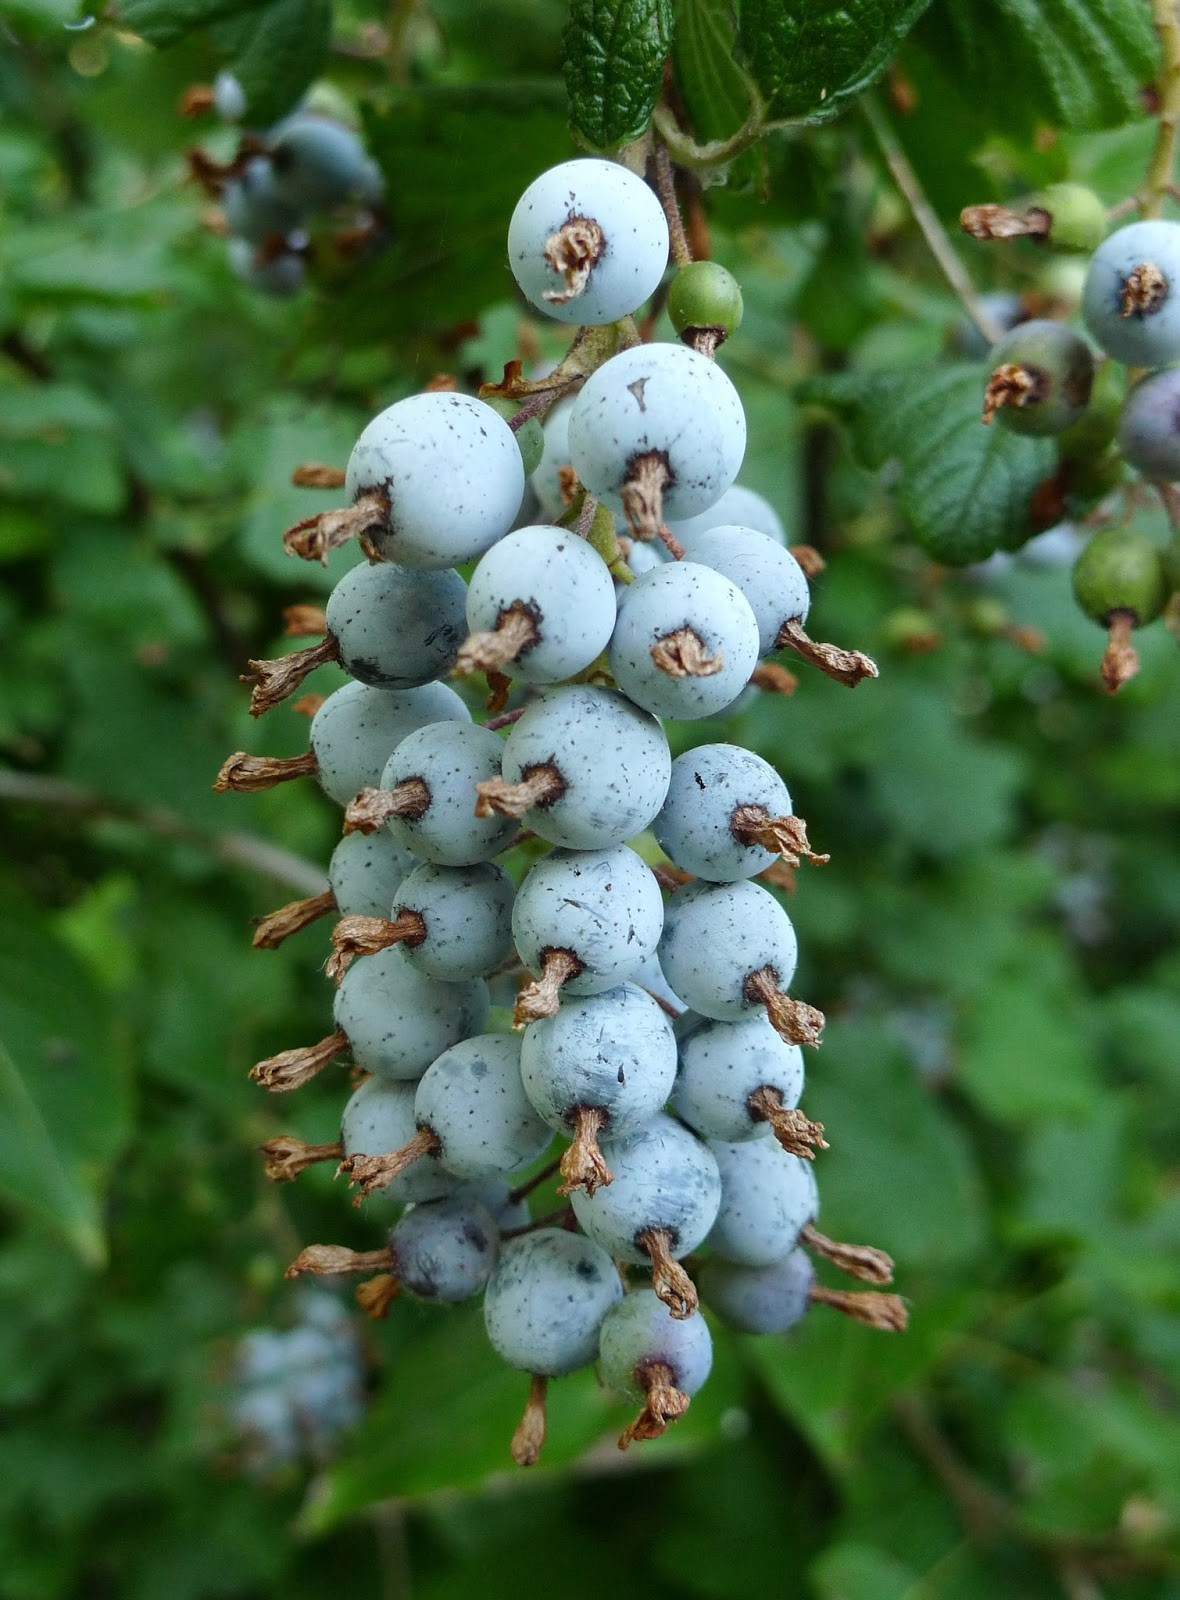 Flowering Currant Bush